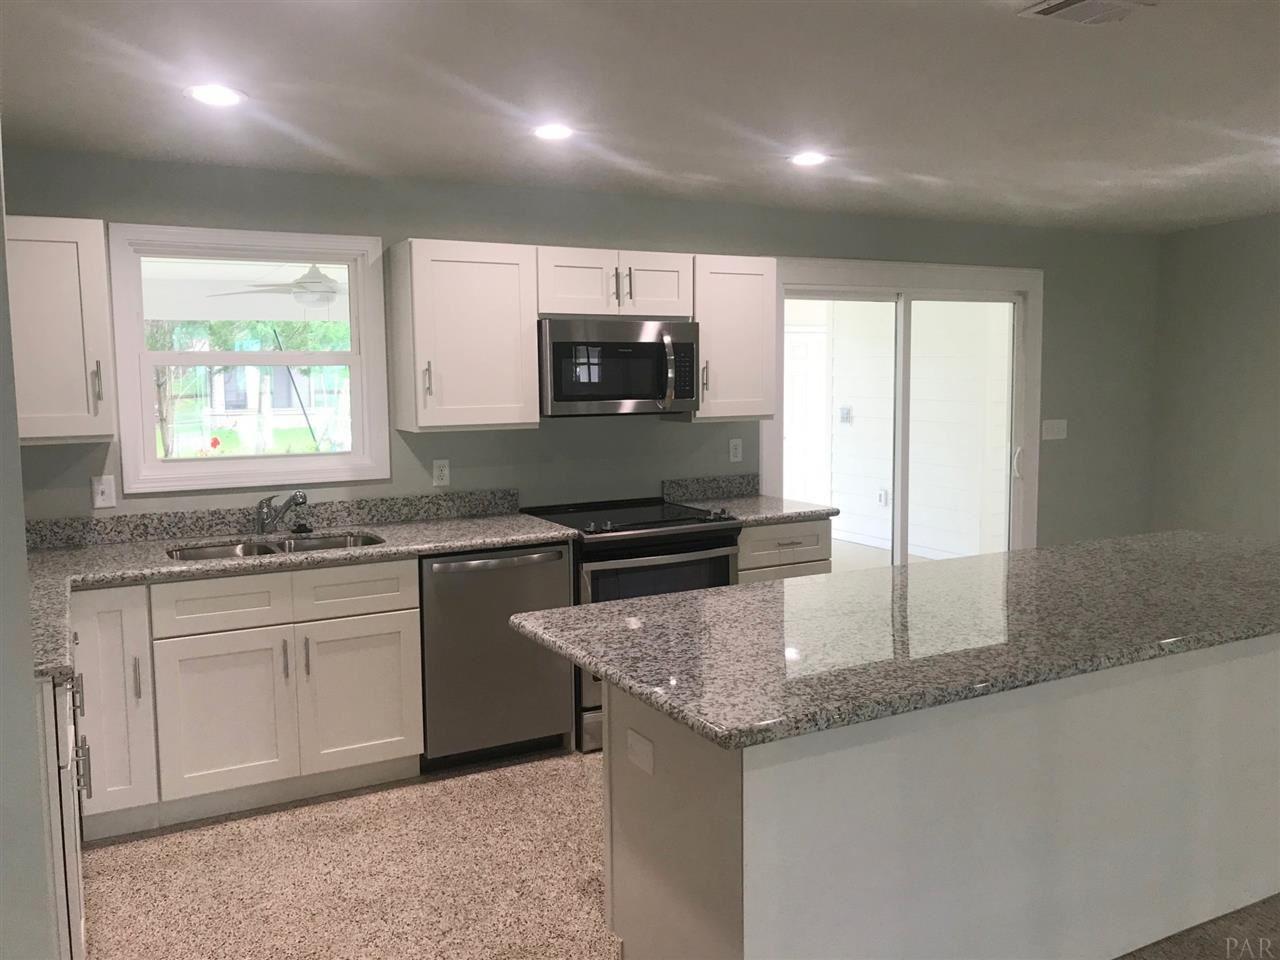 Property Image Of 5900 San Gabriel Dr In Pensacola, Fl